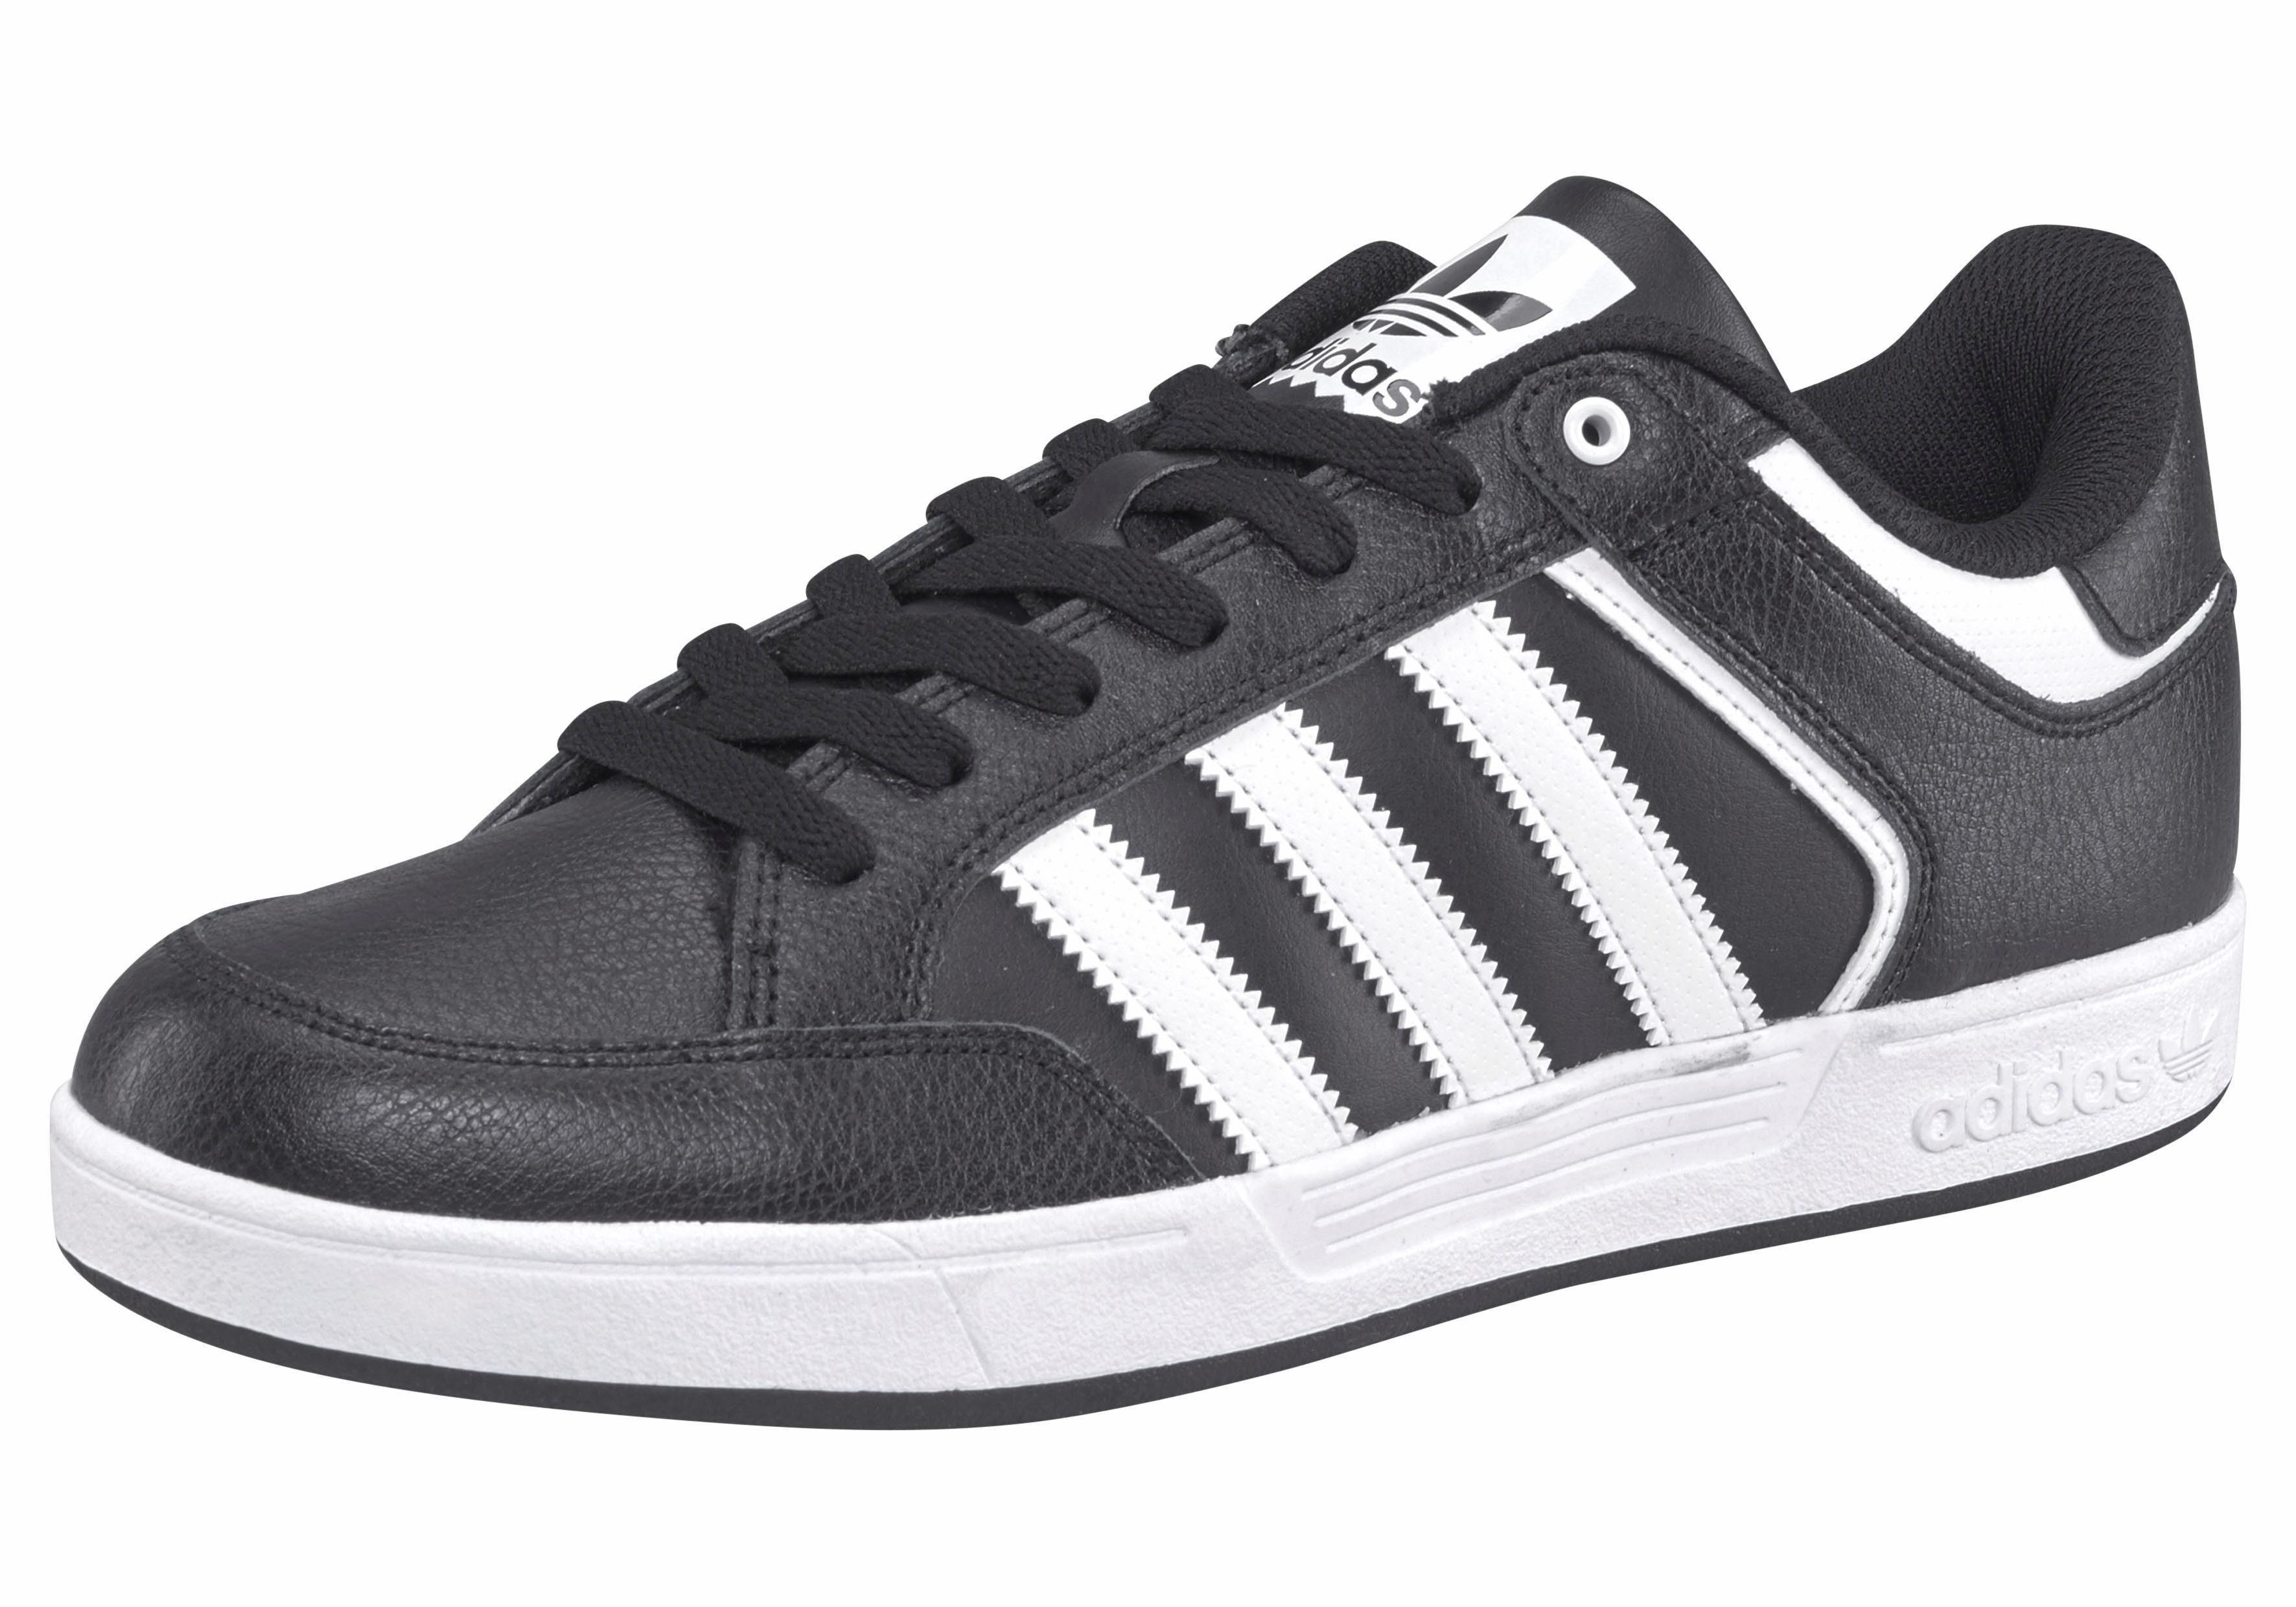 Originals Adidas Кроссовки »varial M« Low E2DI9H